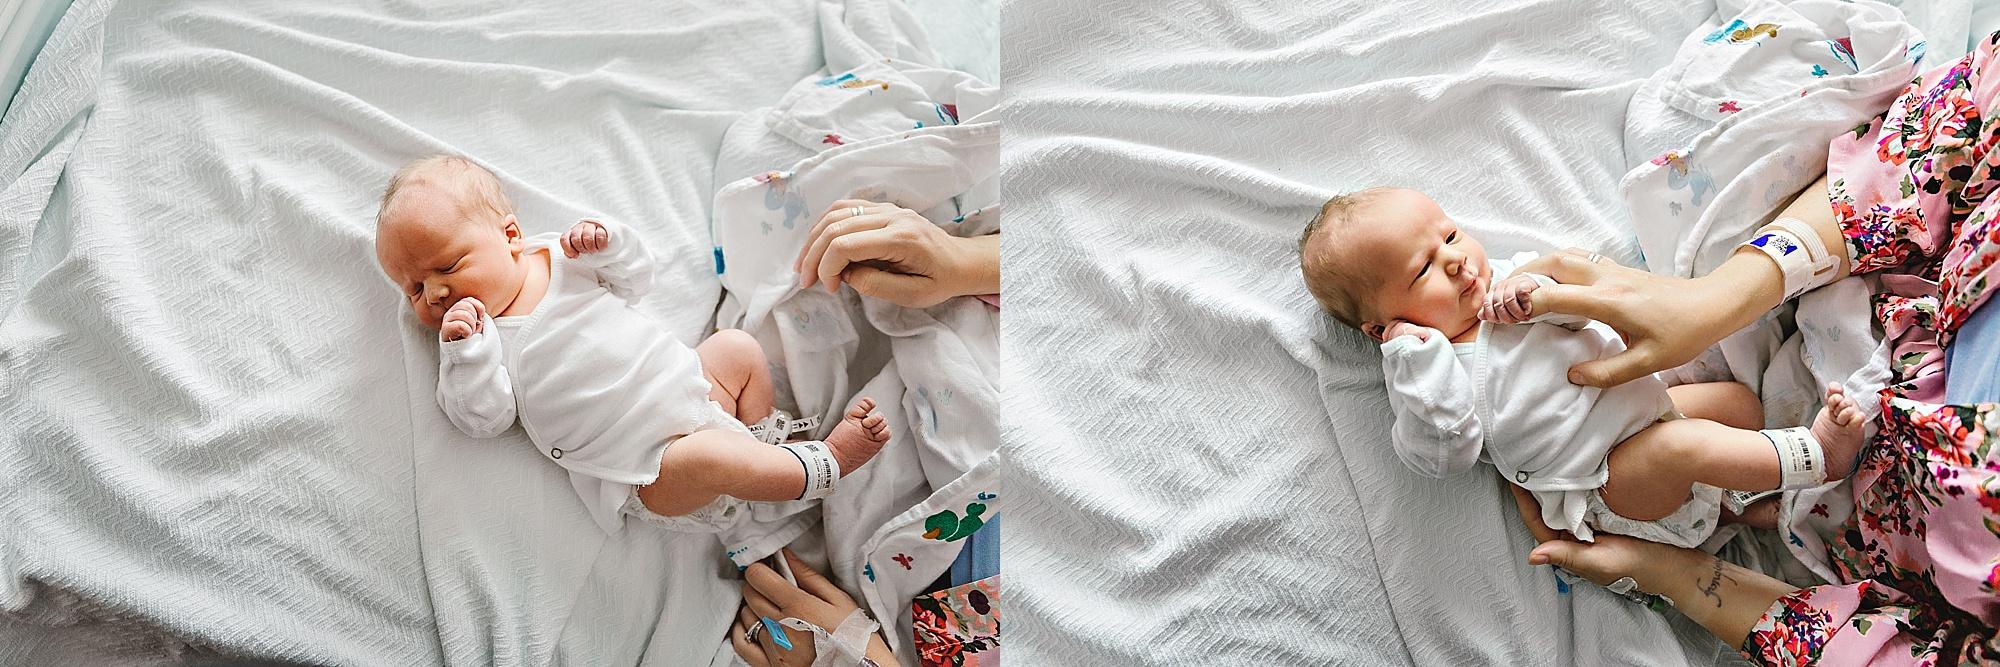 lauren-grayson-photography-akron-ohio-photographer-family-newborn-fresh-48-baby-hospital-photo-shoot-cleveland-clinic-akron-general-carter_0309.jpg